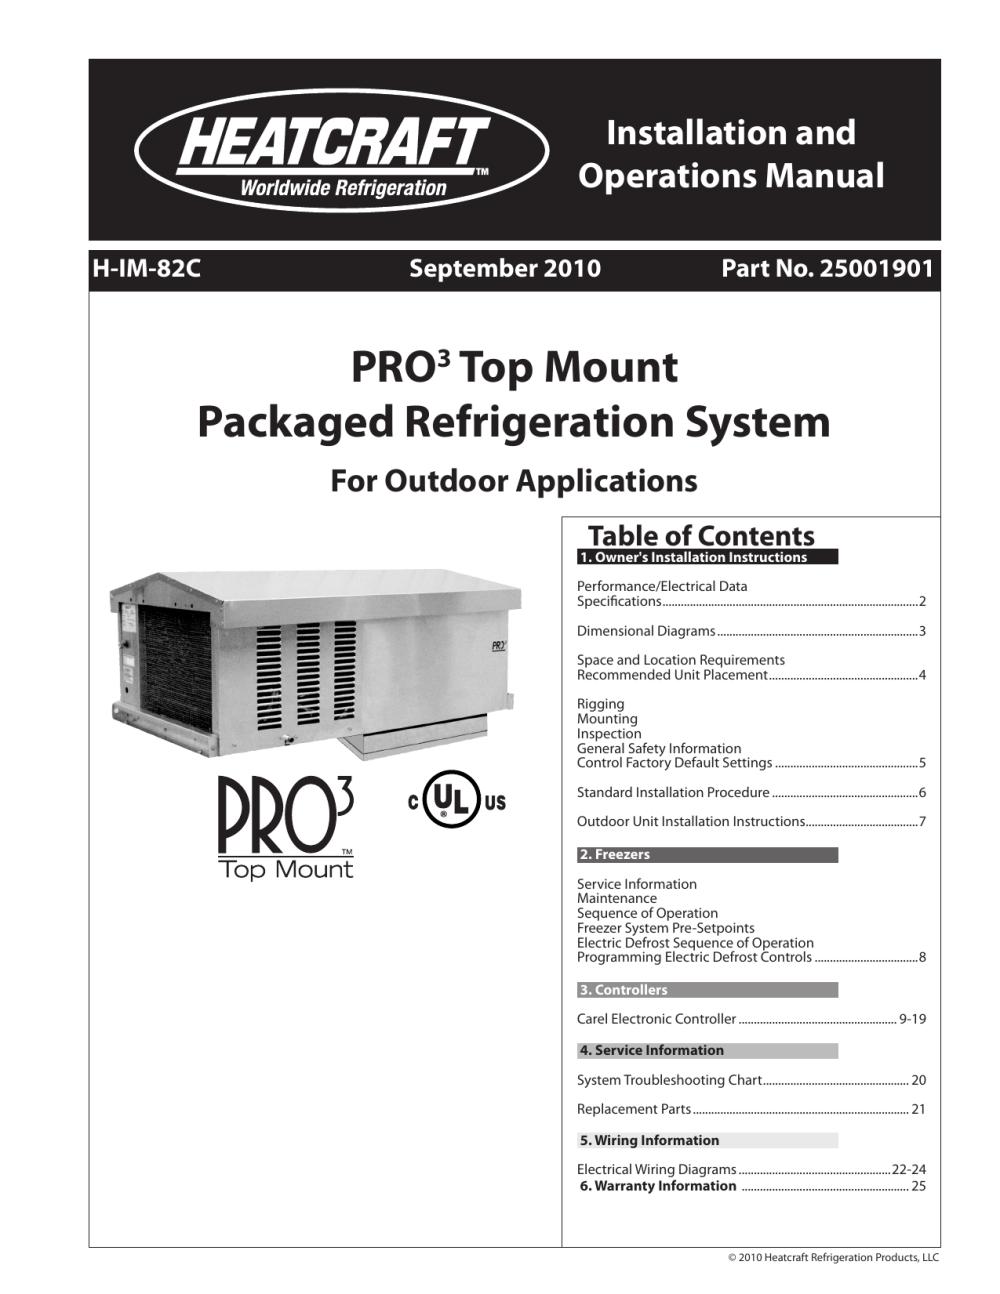 medium resolution of heatcraft refrigeration products h im 82c user s manual